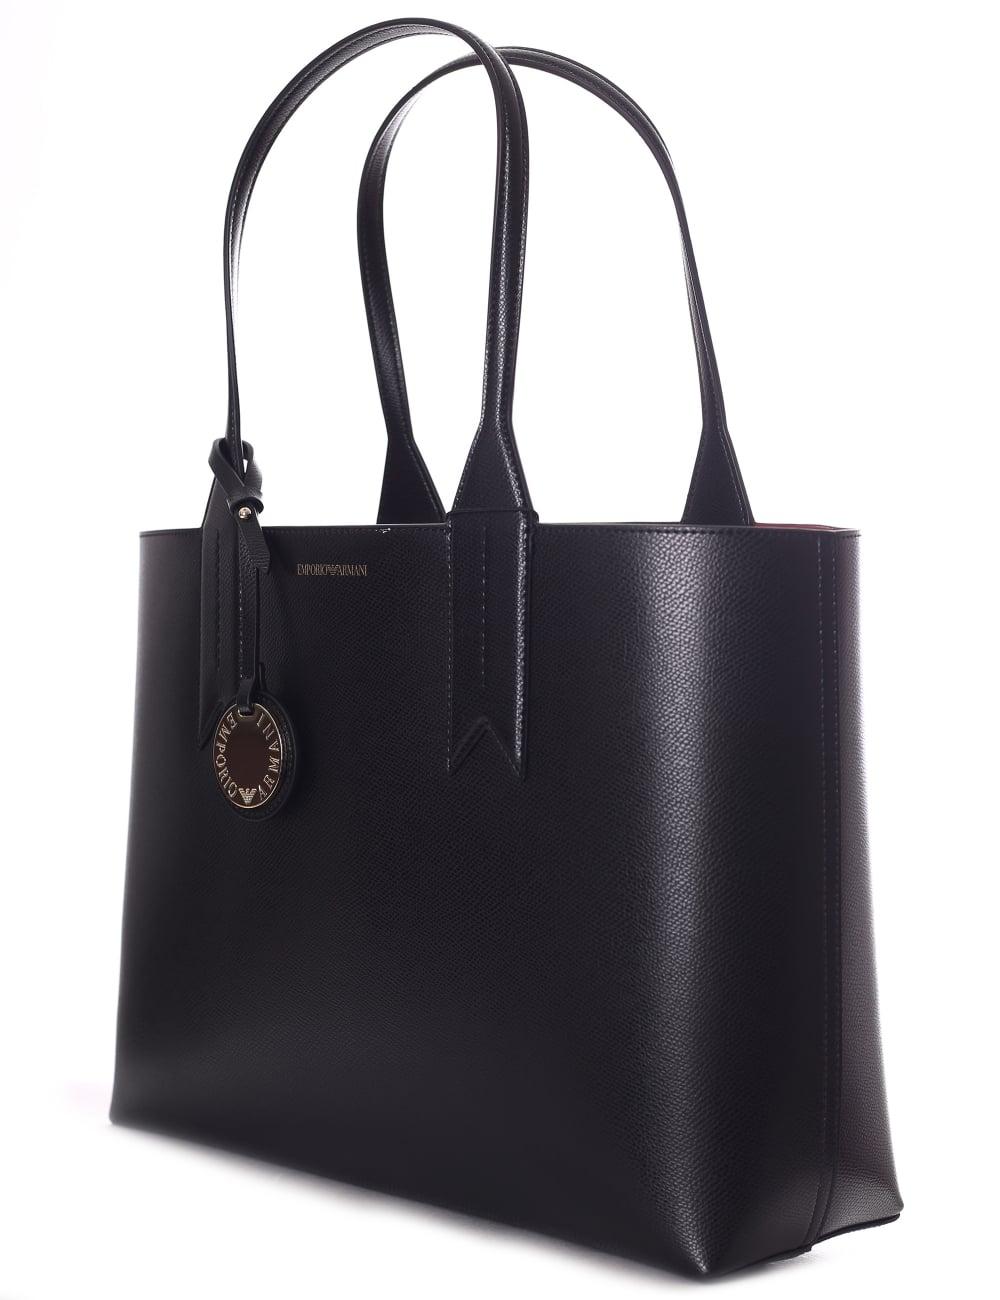 350b1ae1e Emporio Armani Borsa Women's Large Shopping Bag